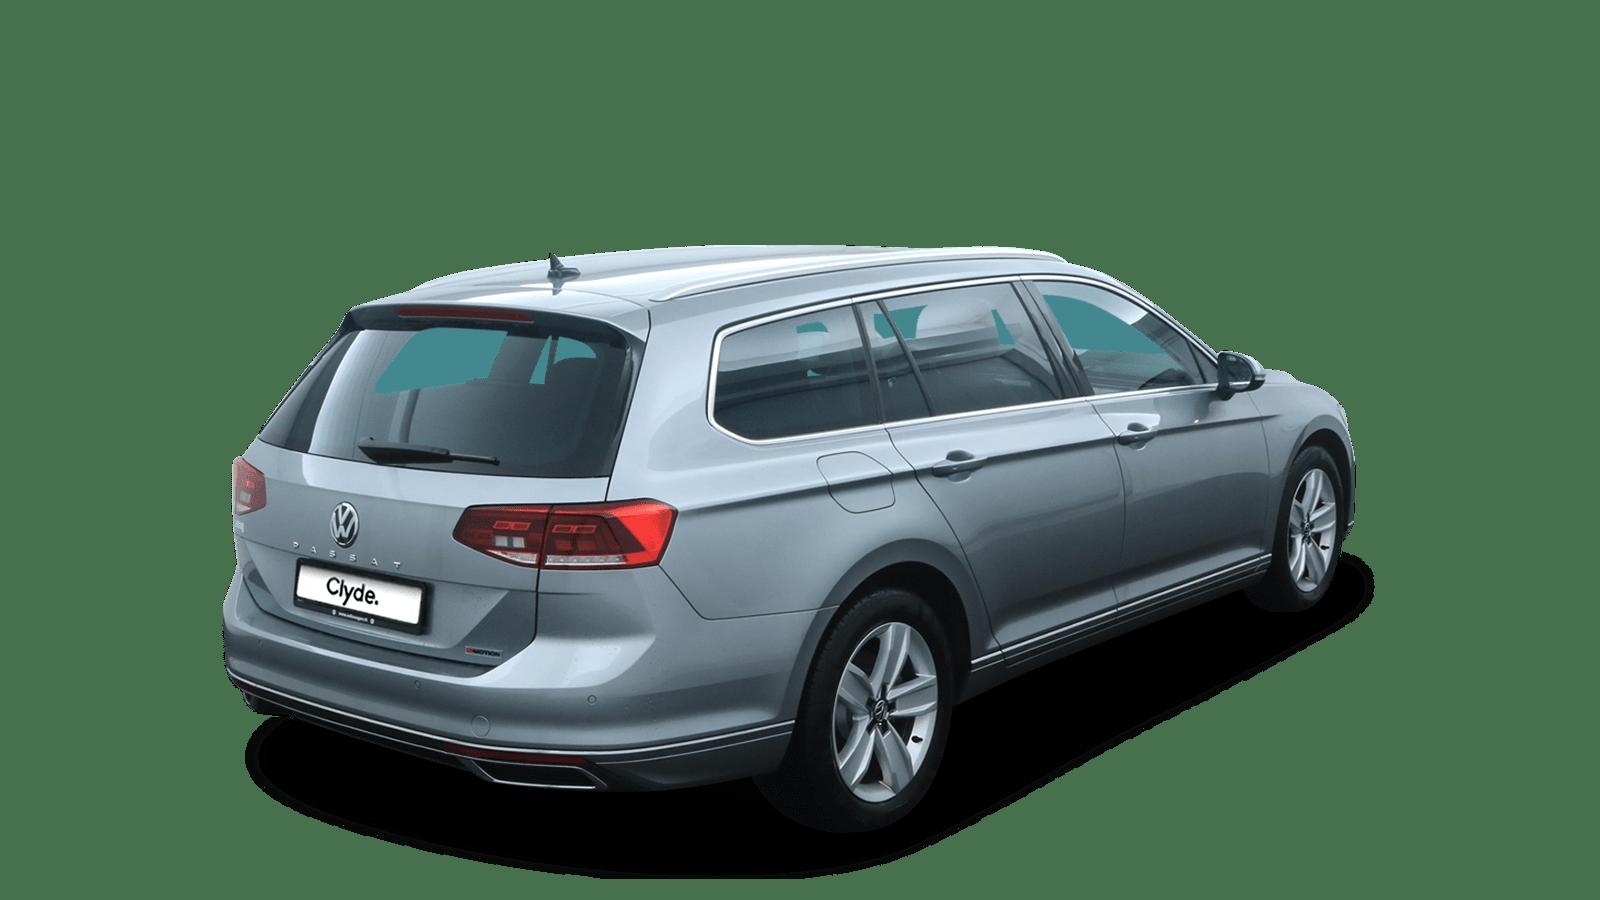 VW Passat Variant Silver back - Clyde car subscription